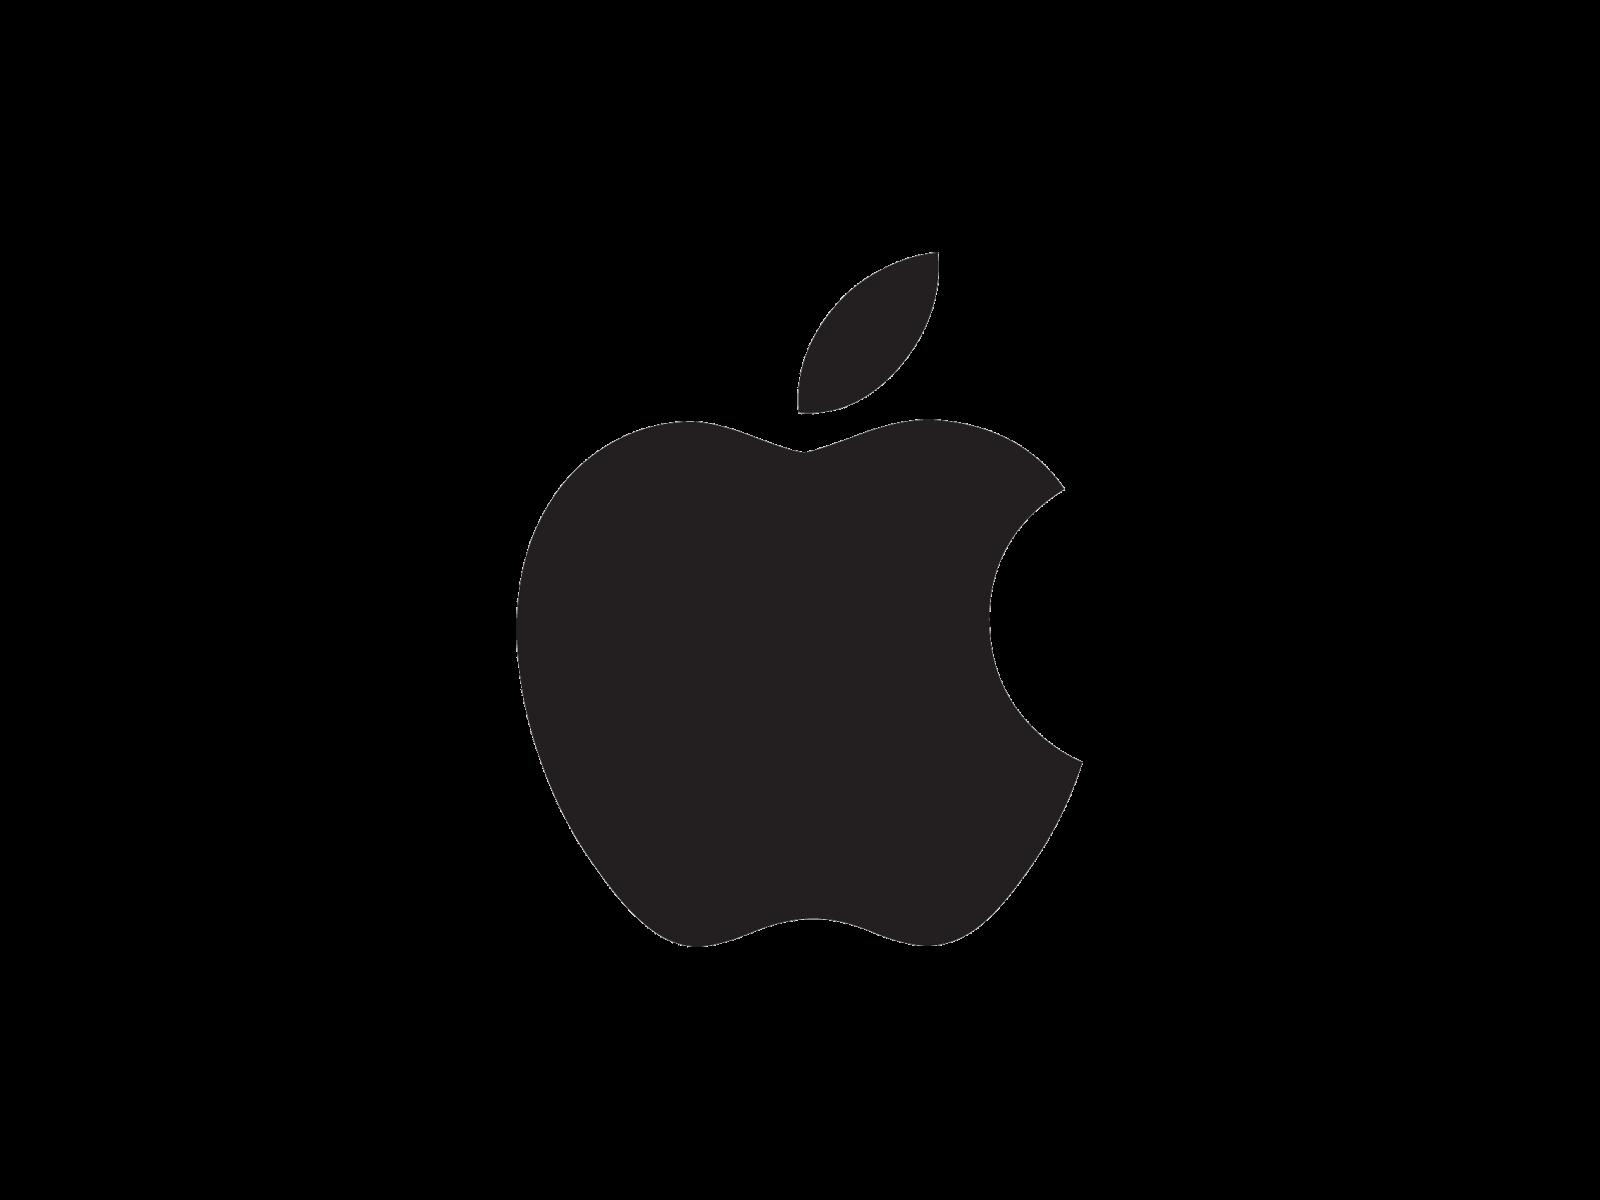 Apple-pode-se-tornar-montadora-de-carros